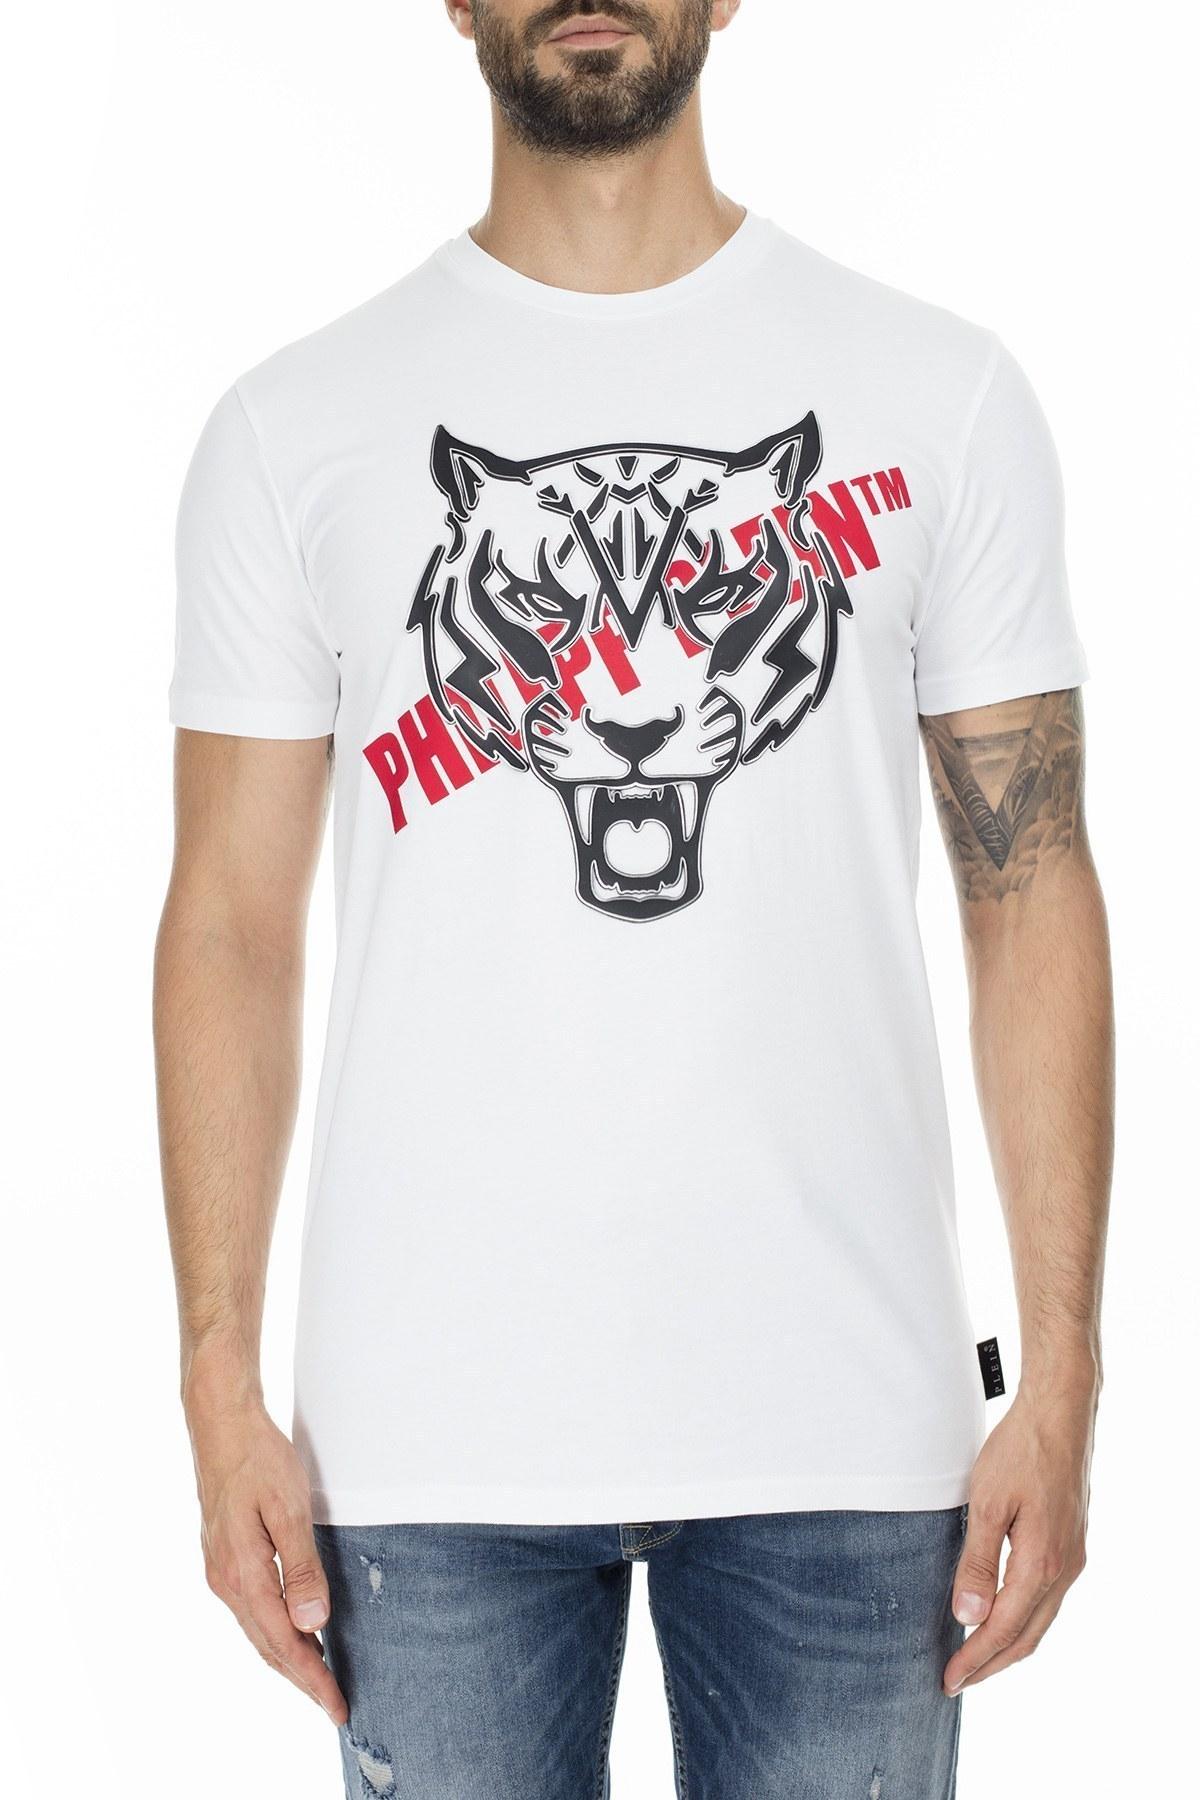 Philipp Plein Erkek T Shirt P20C MTK4484 PJY002N 01 BEYAZ